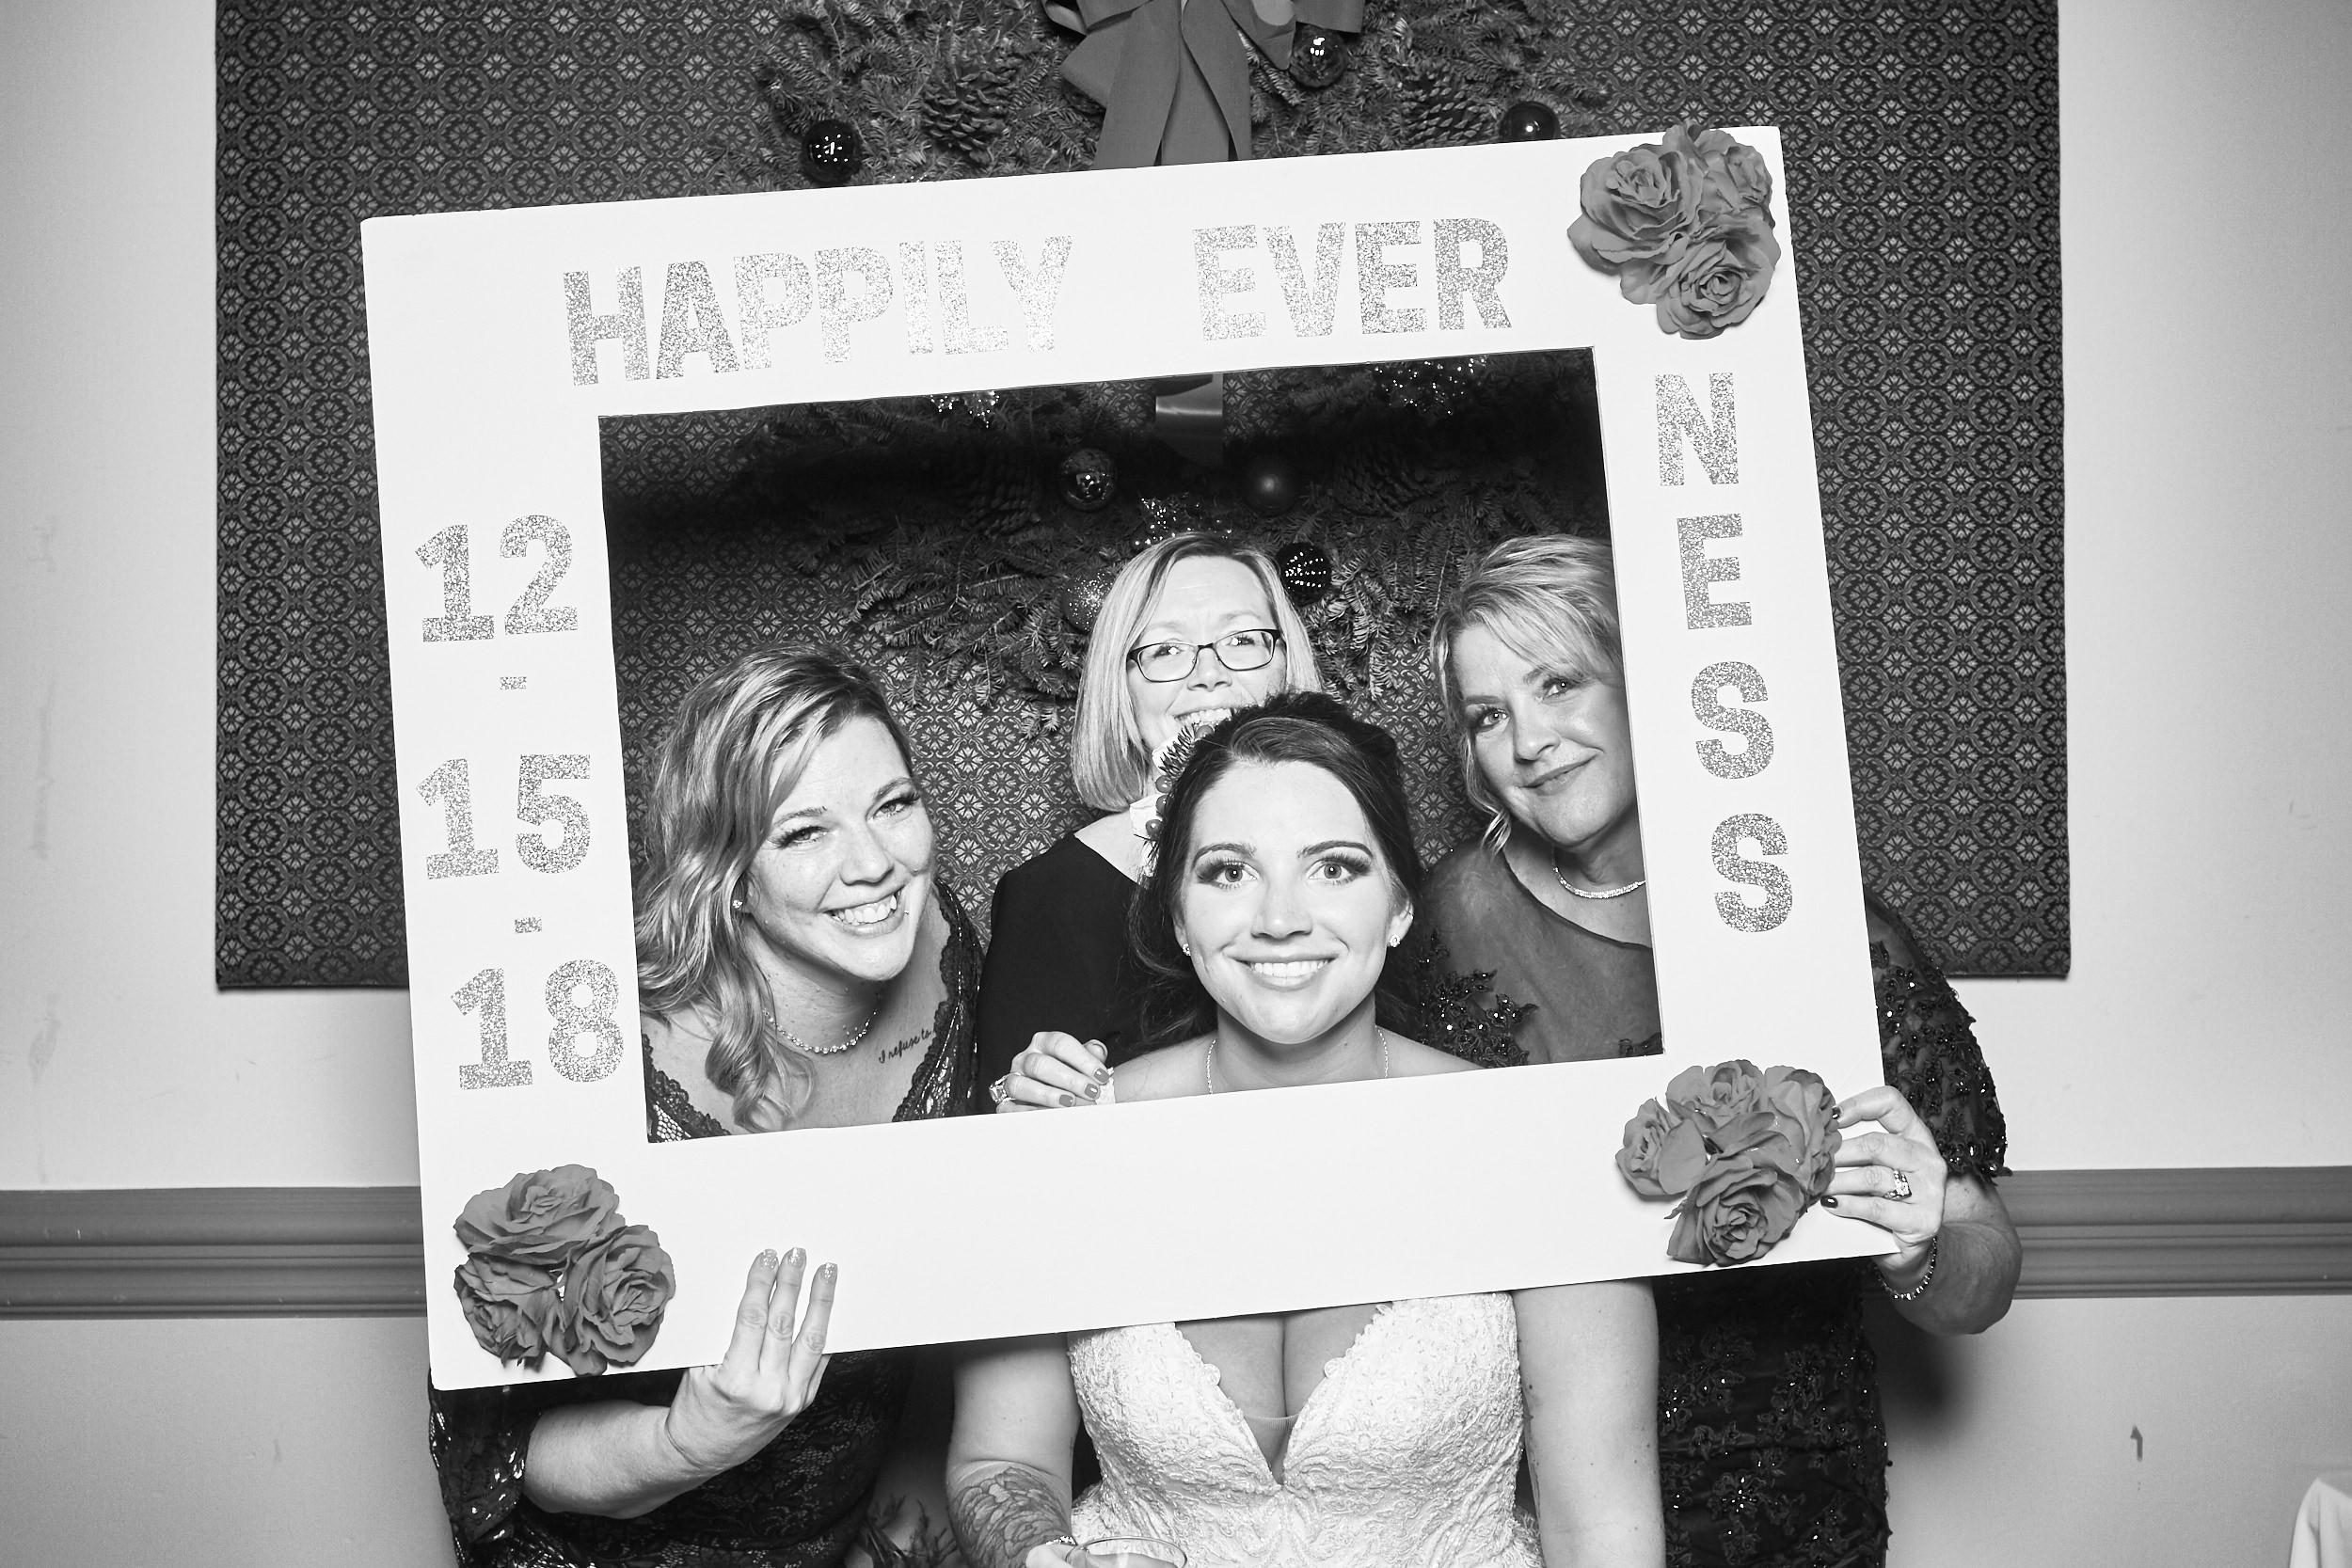 Alexa-James-Wedding-Photo-Booth997.jpg